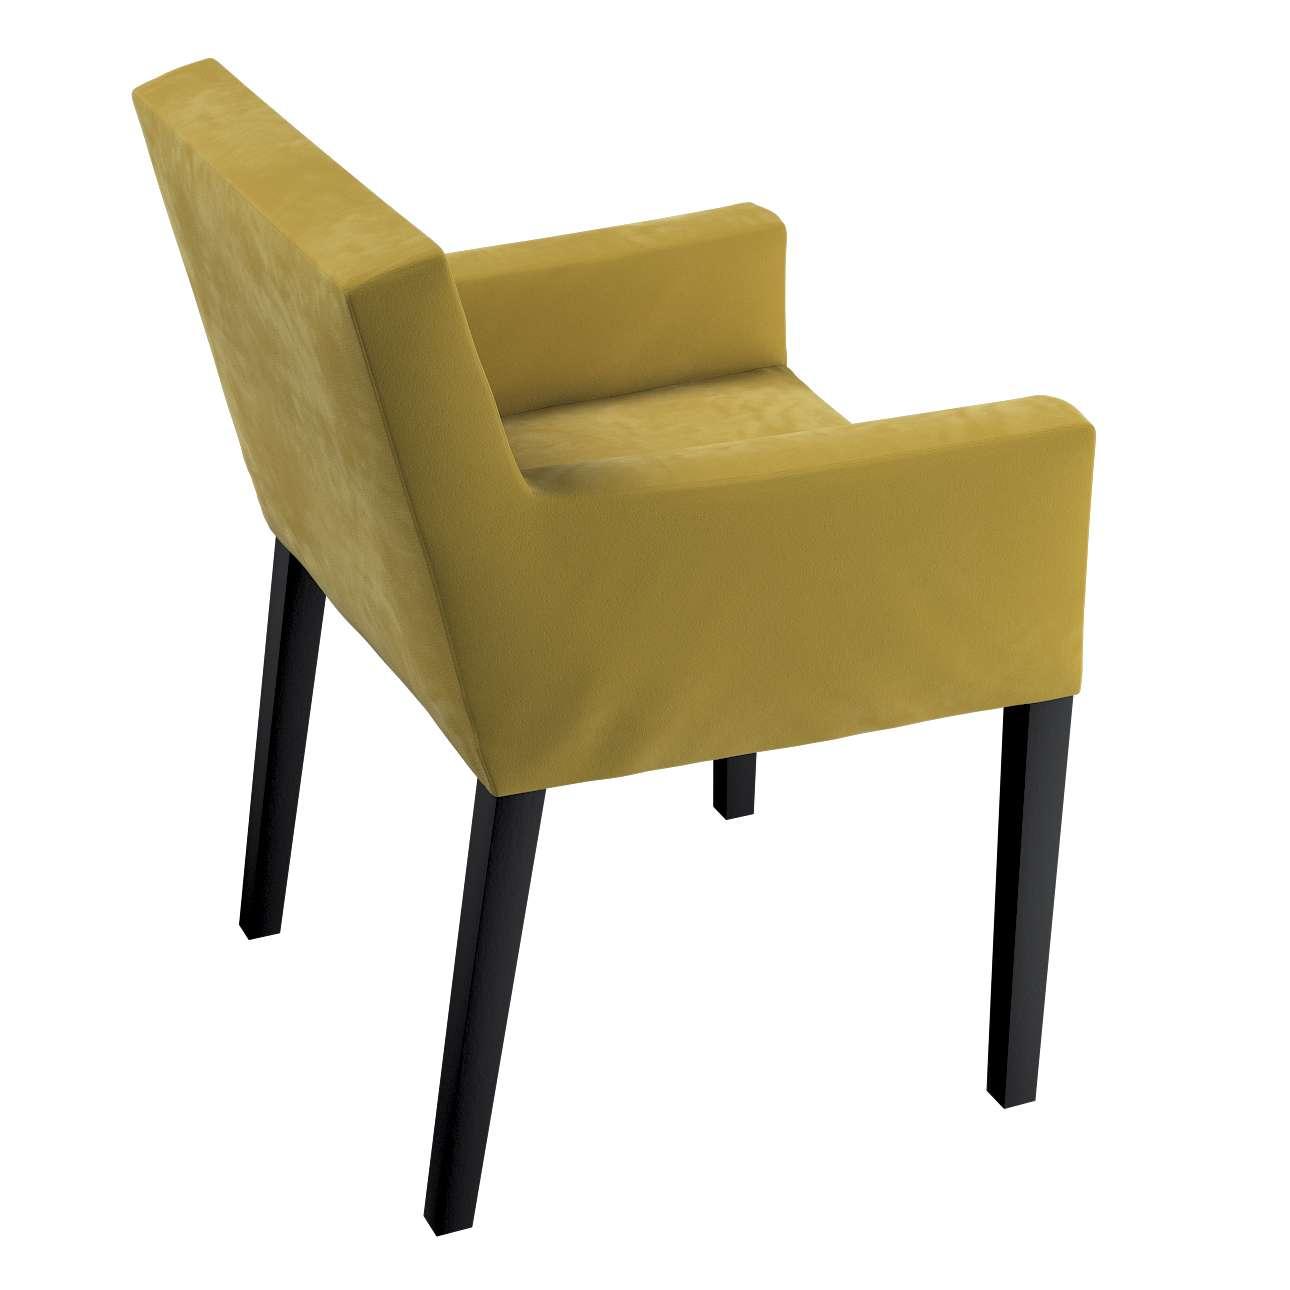 Návlek na stoličku s opierkami Nils V kolekcii Velvet, tkanina: 704-27